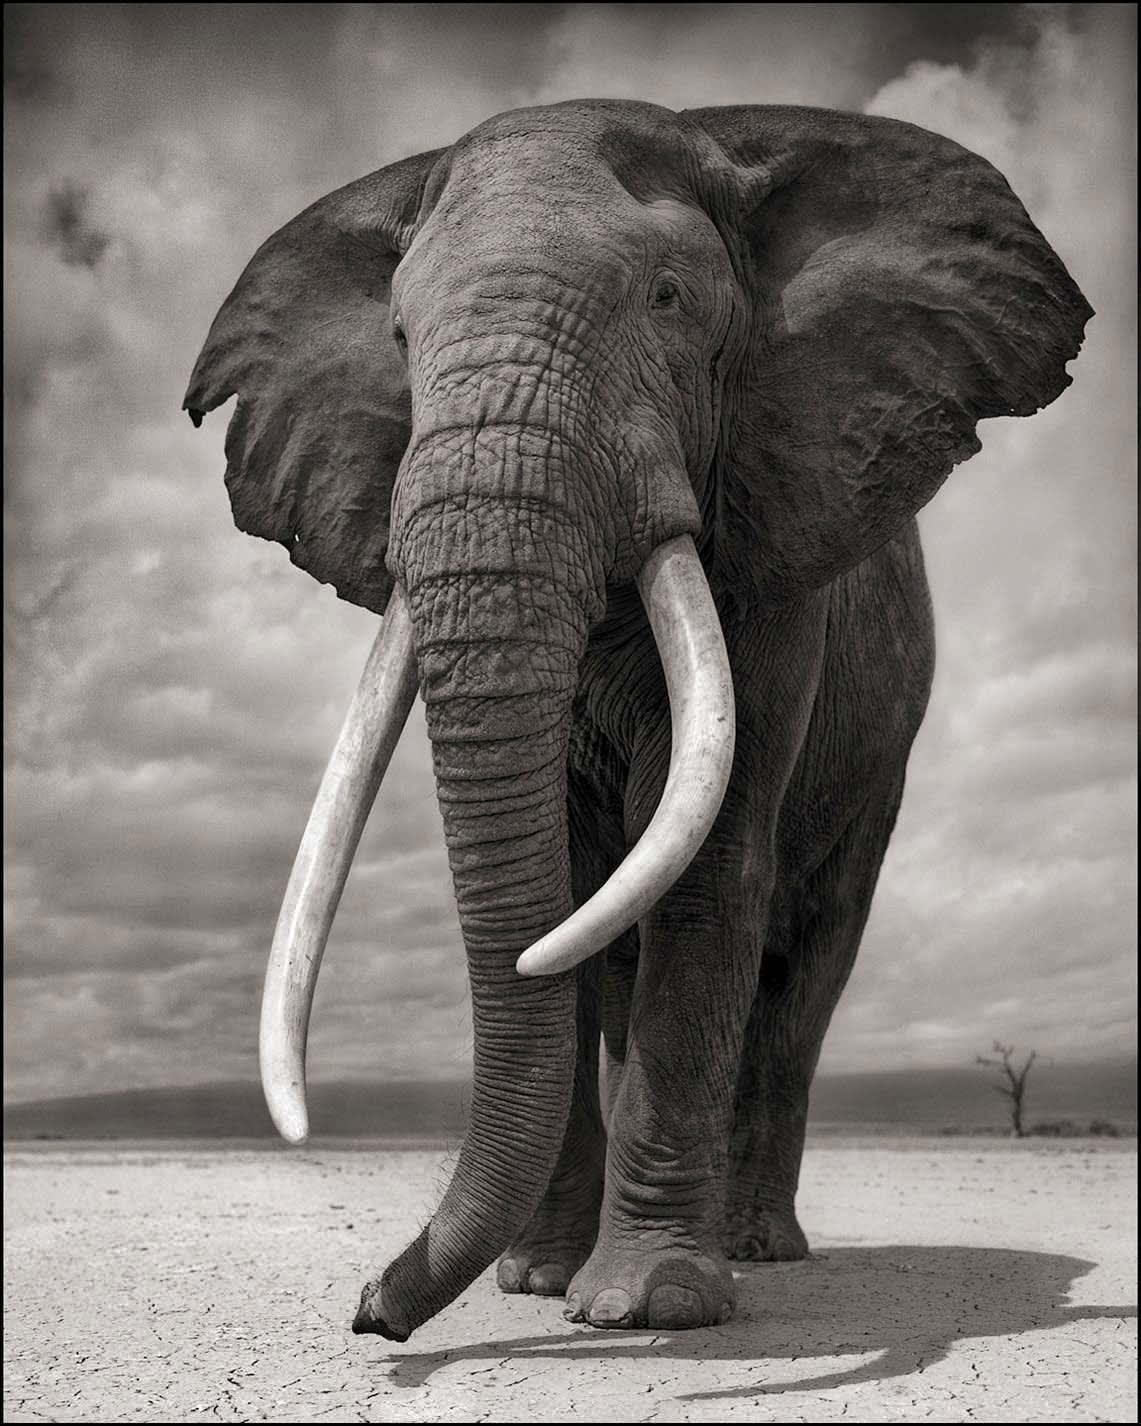 Nick Brandt photograph of elephant on bare earth, Amboseli